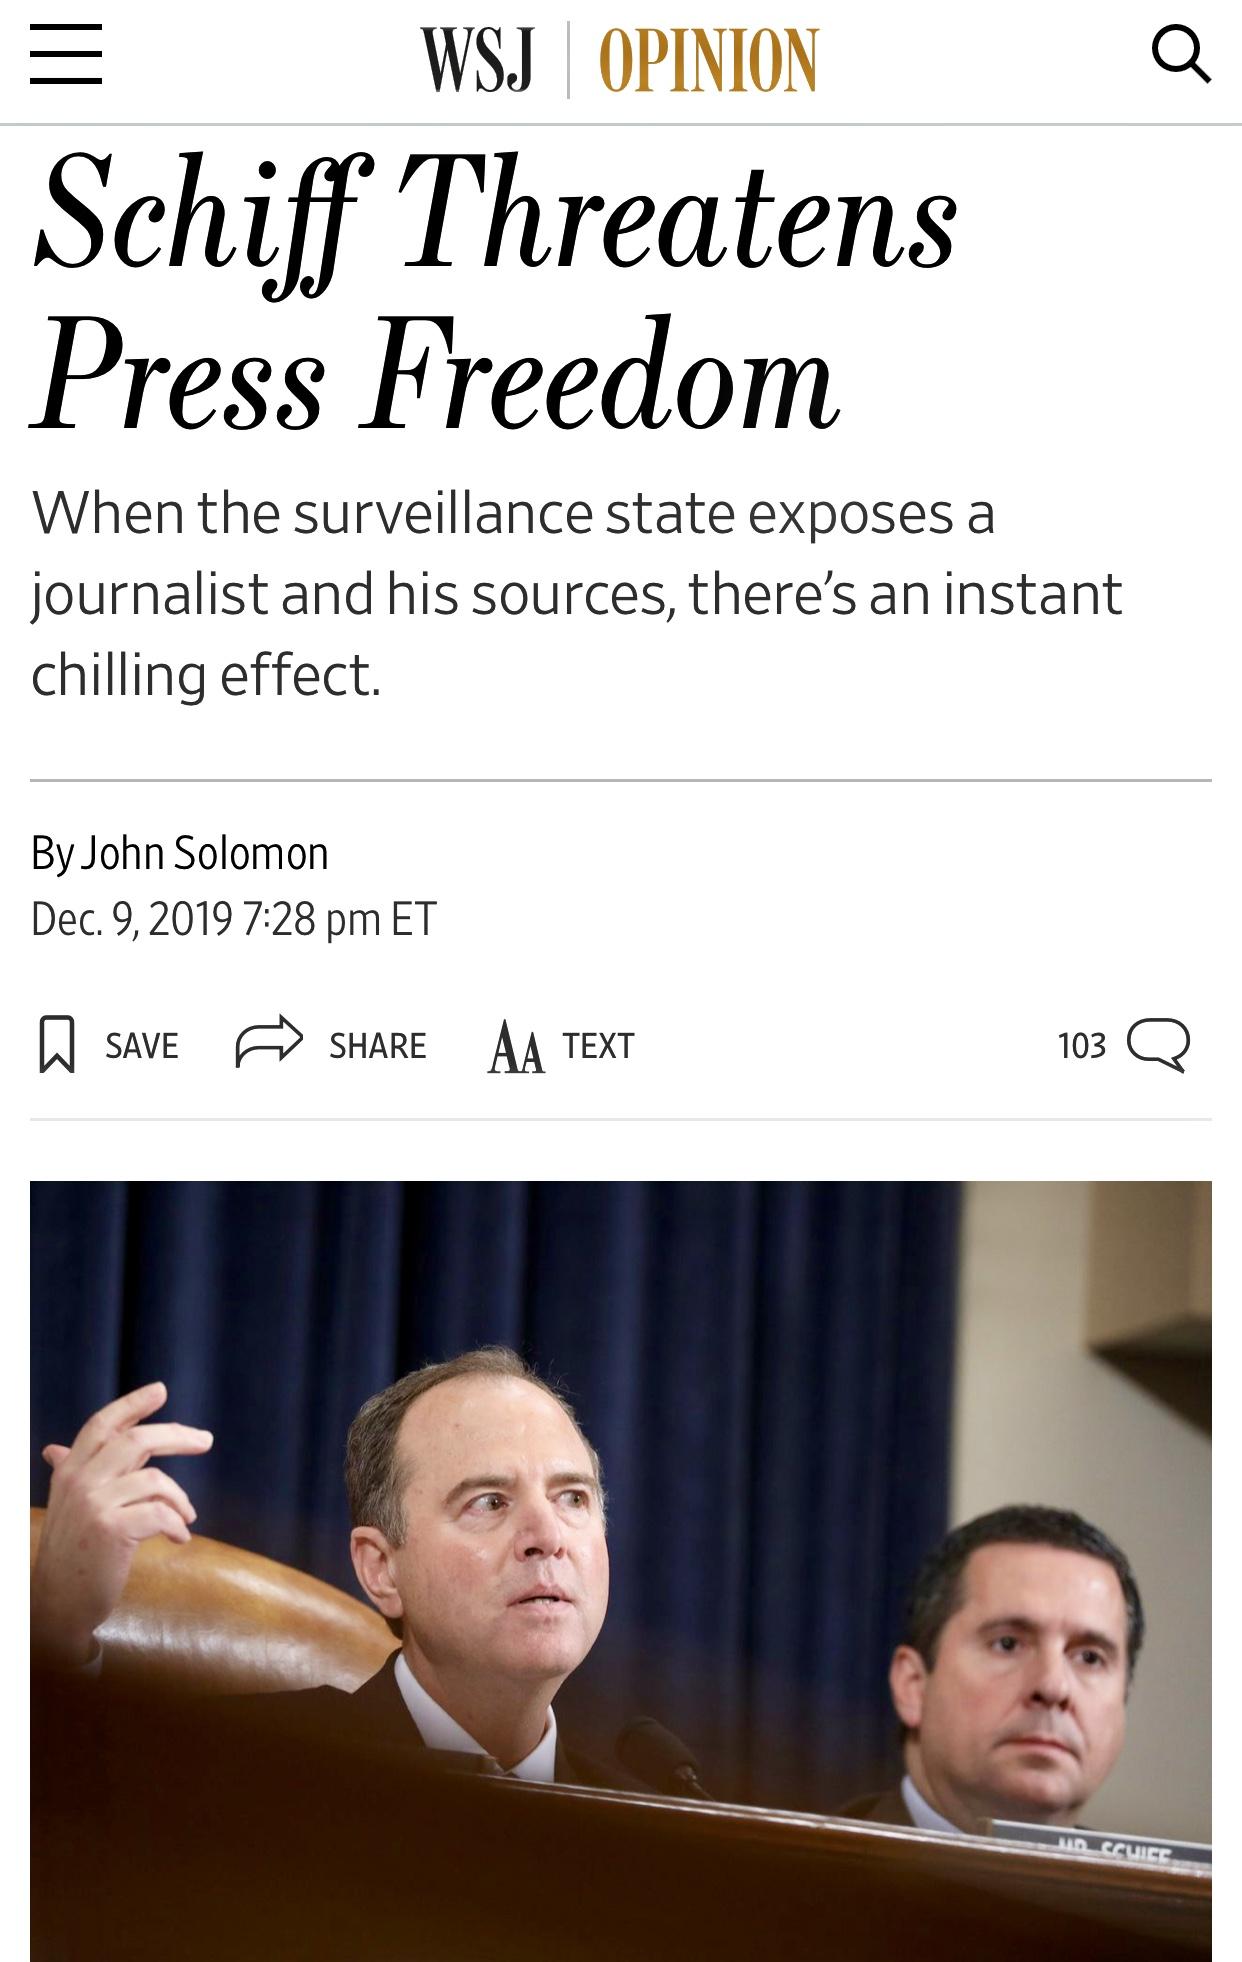 Schiff Threatens Press Freedom